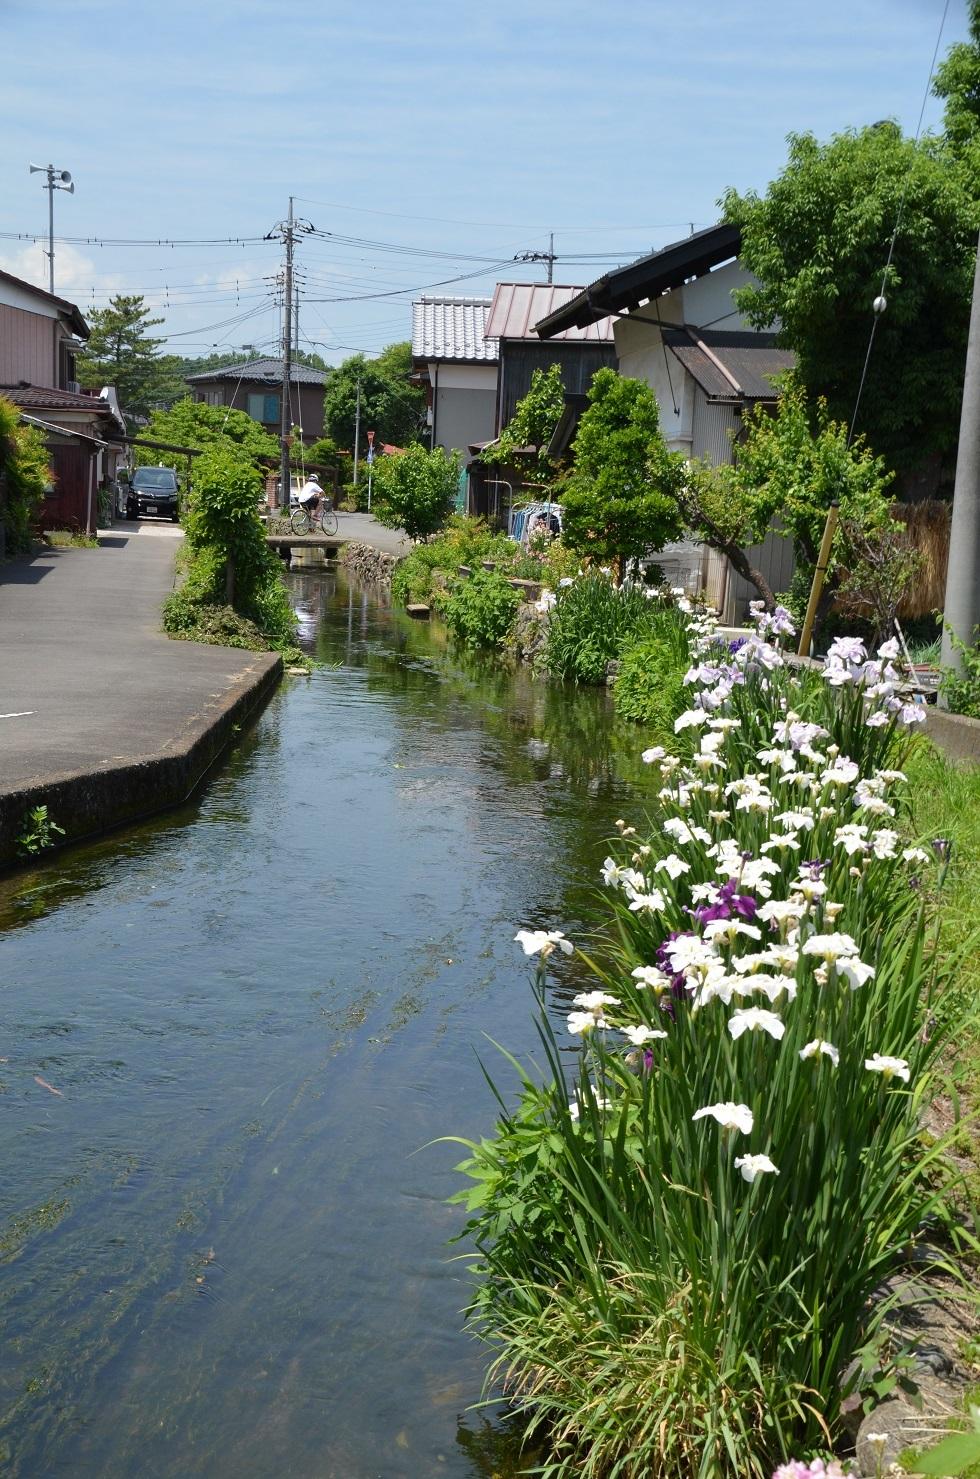 DSC_0151水路菖蒲